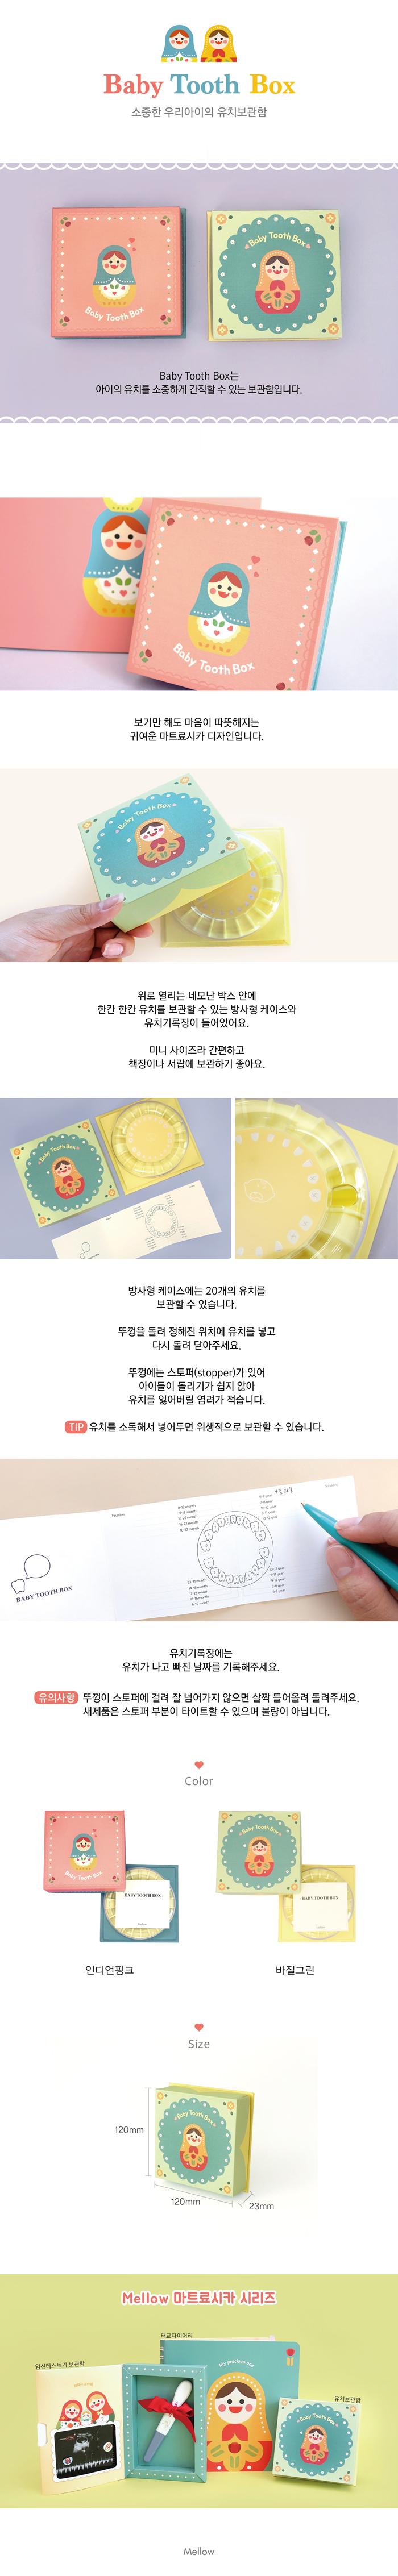 Baby Tooth Box - 마트료시카 (유치보관함) - 멜로우, 14,000원, 다이어리/성장앨범, 임신/출산 다이어리